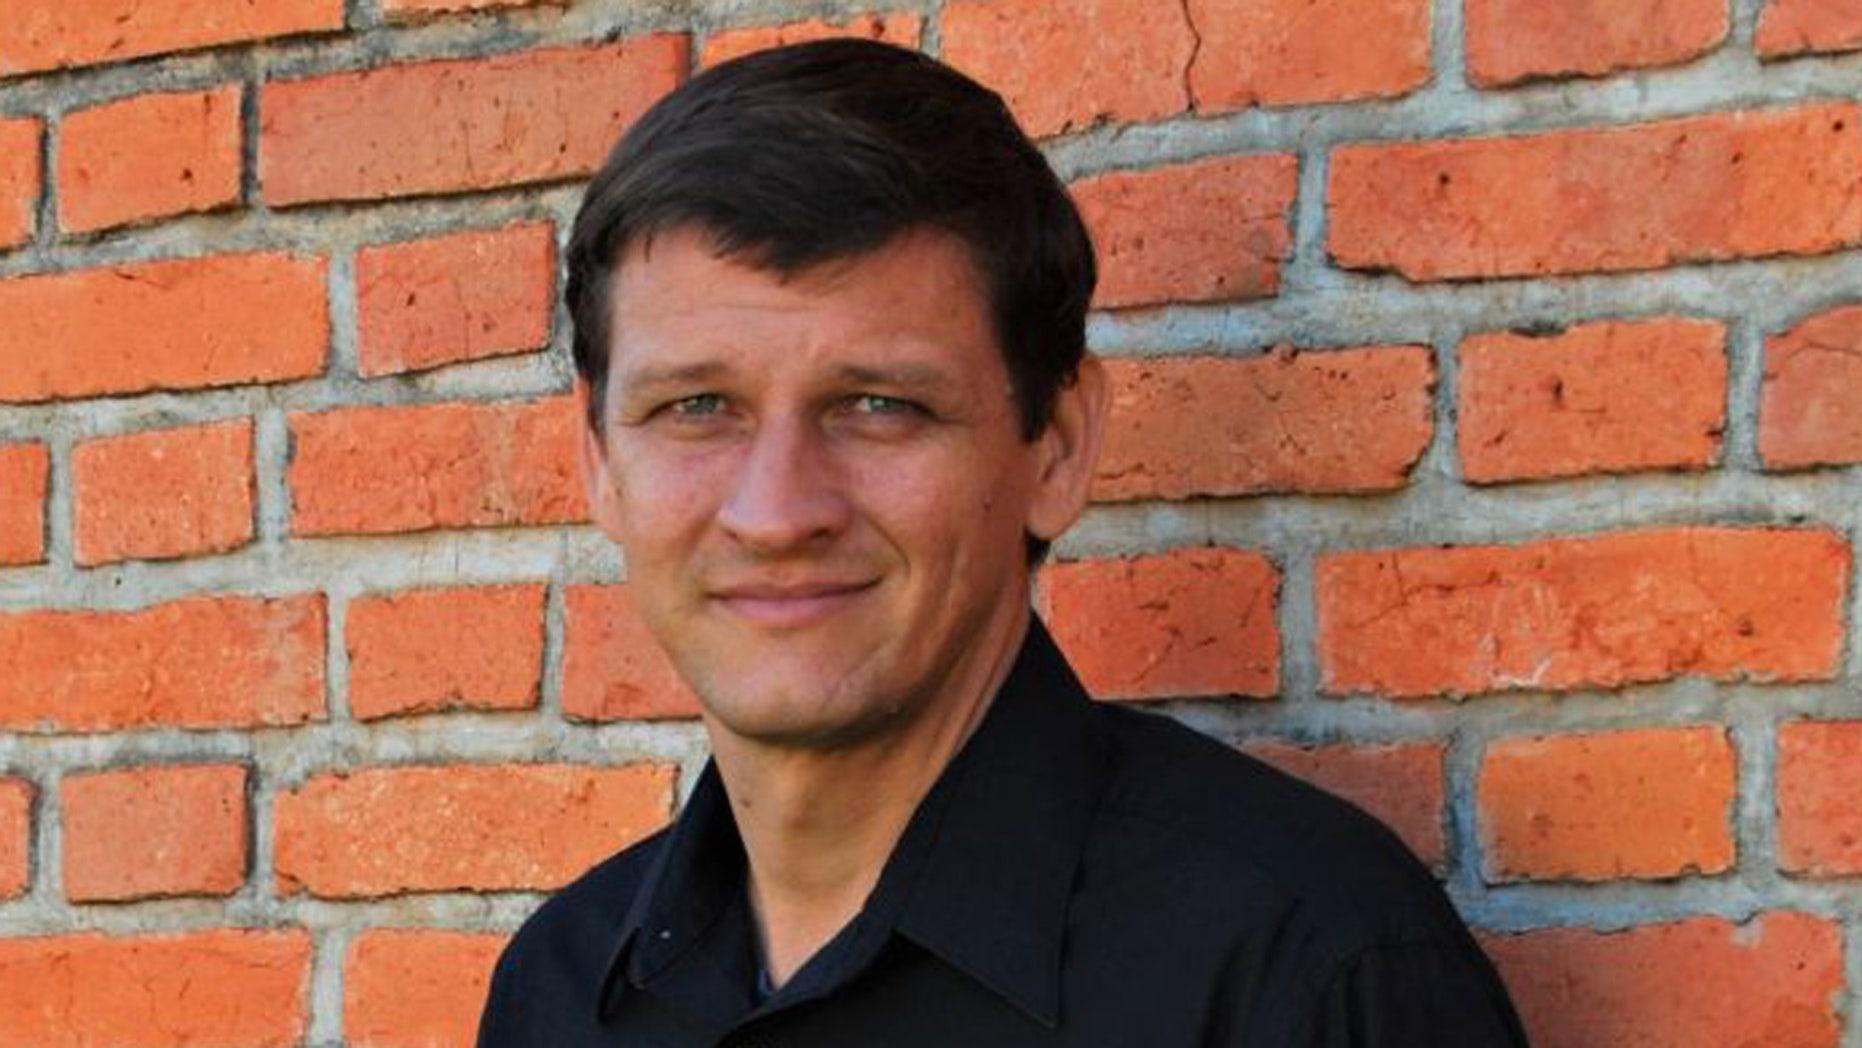 Westlake Legal Group WayneGoddardEthnos360a American Christian missionary gunned down in Paraguay fox-news/world/religion/christianity fox-news/world/religion fox-news/faith-values/faith fox news fnc/world fnc Caleb Parke article a8835ecd-9876-5469-a085-440e7c781508